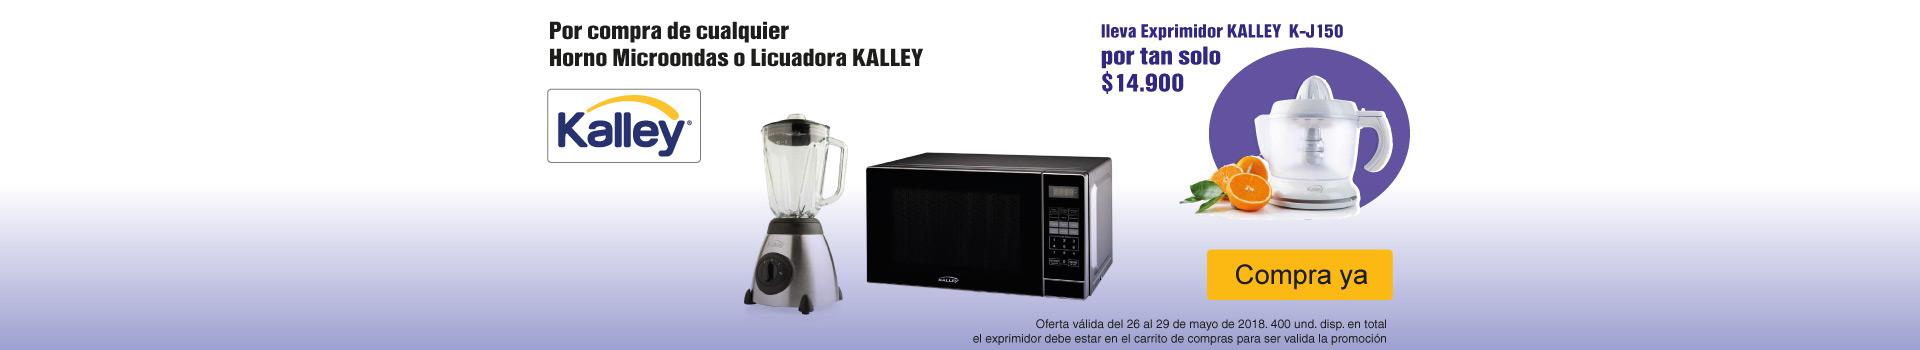 AK-KT-HIPER-2-MENORES-PELECTRO-DCAT-Kalley-MICROONDAS-LICUADORAS-May26